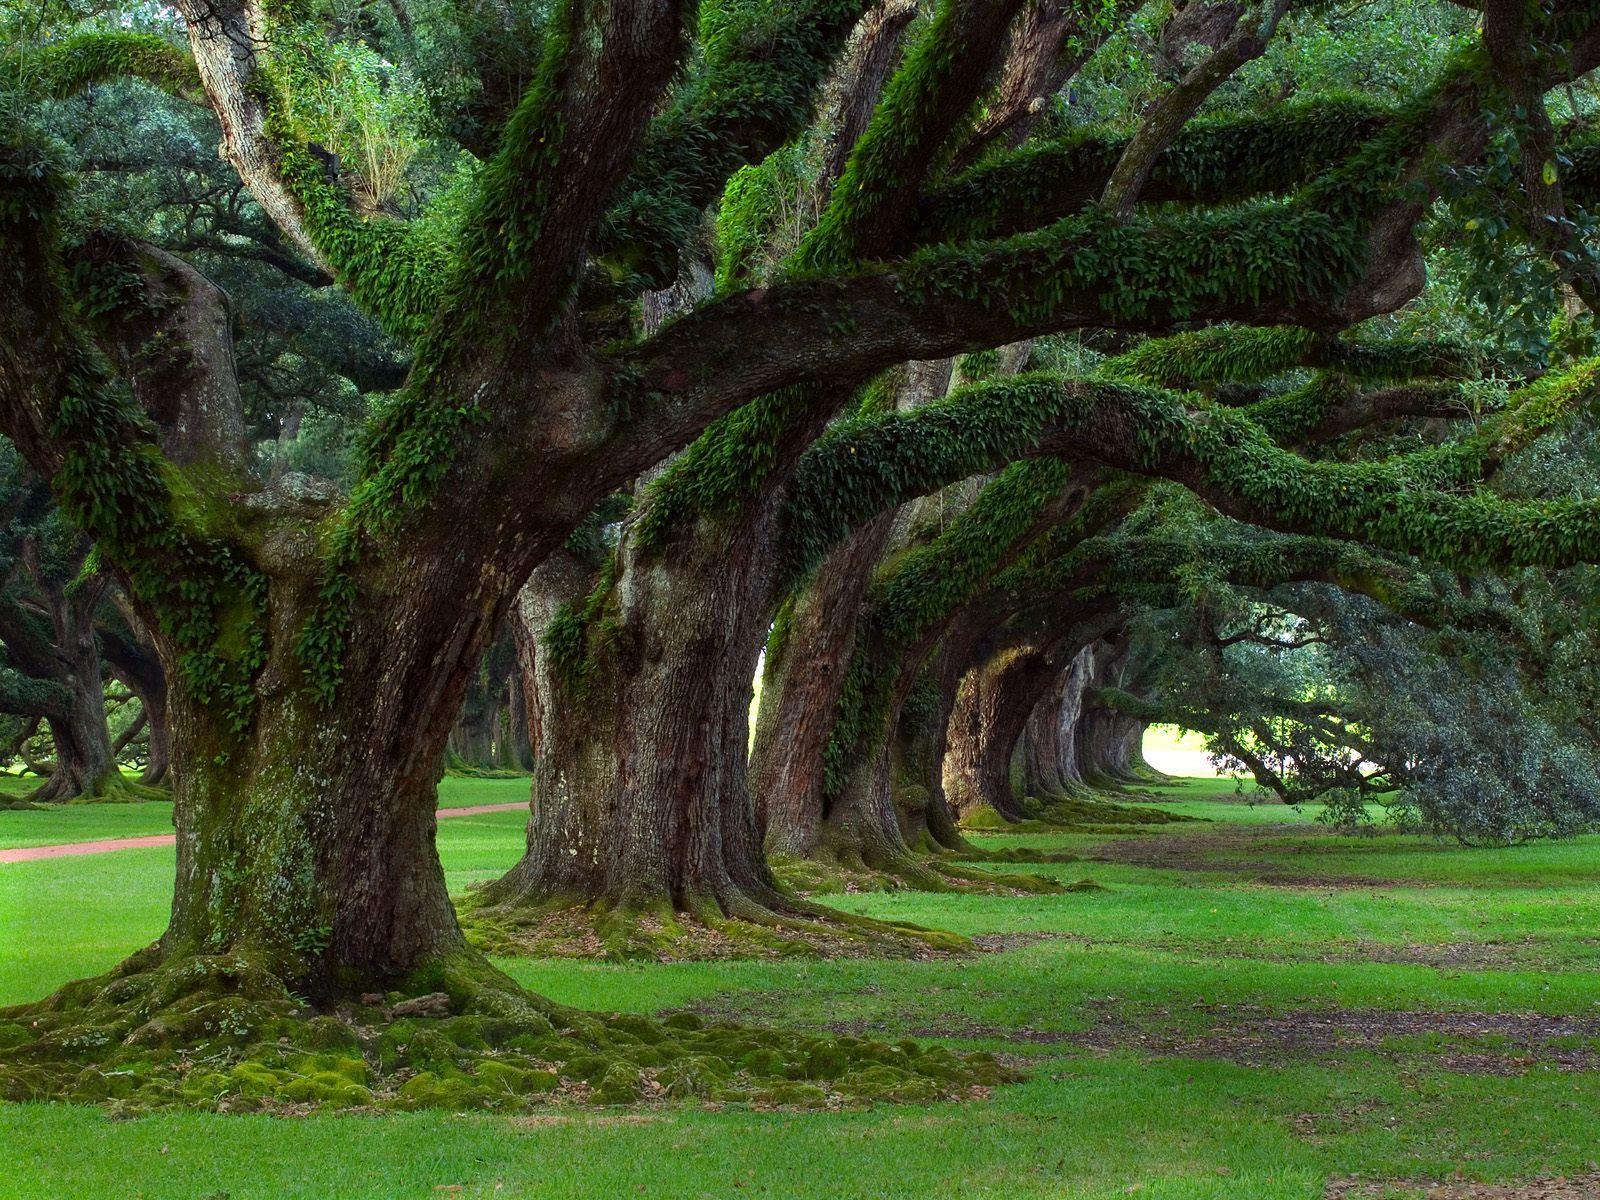 613be8dad Old trees Belas Paisagens, Lindas Paisagens, Árvores Verdes, Natureza  Verde, Árvores Brasileiras